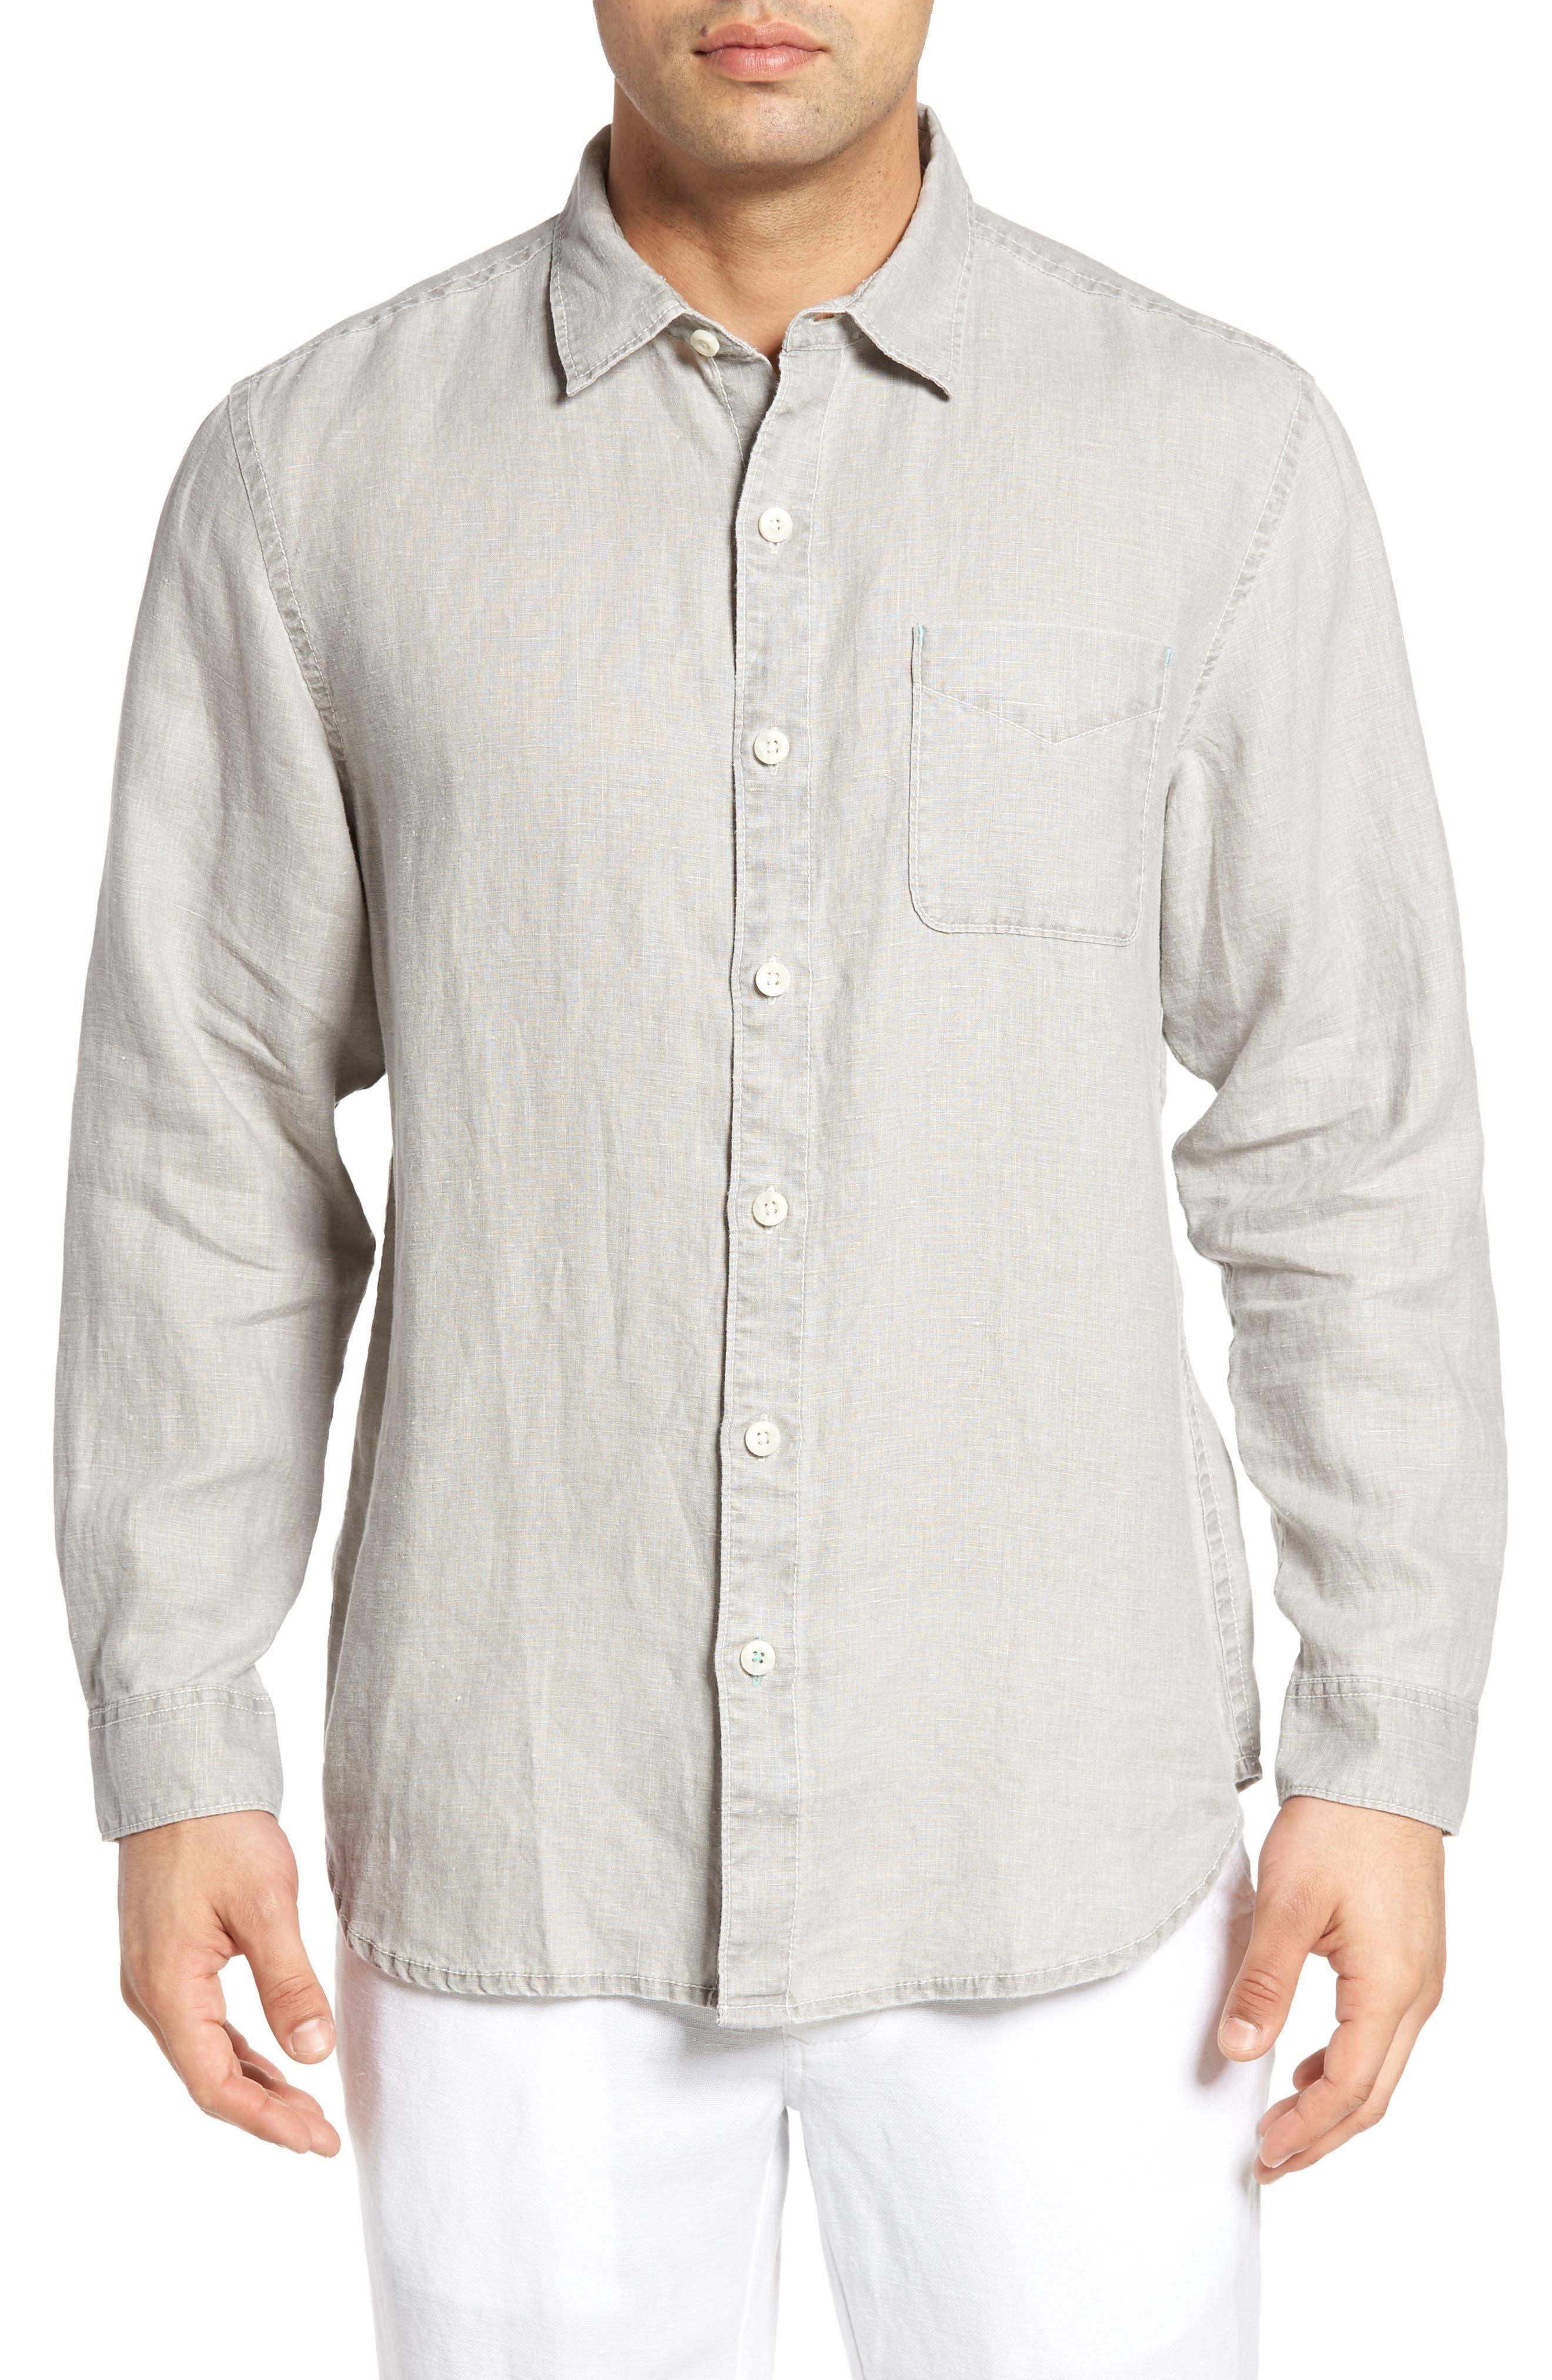 TOMMY BAHAMA 'Sea Glass Breezer' Original Fit Linen Shirt, Main, color, LIGHT GREY